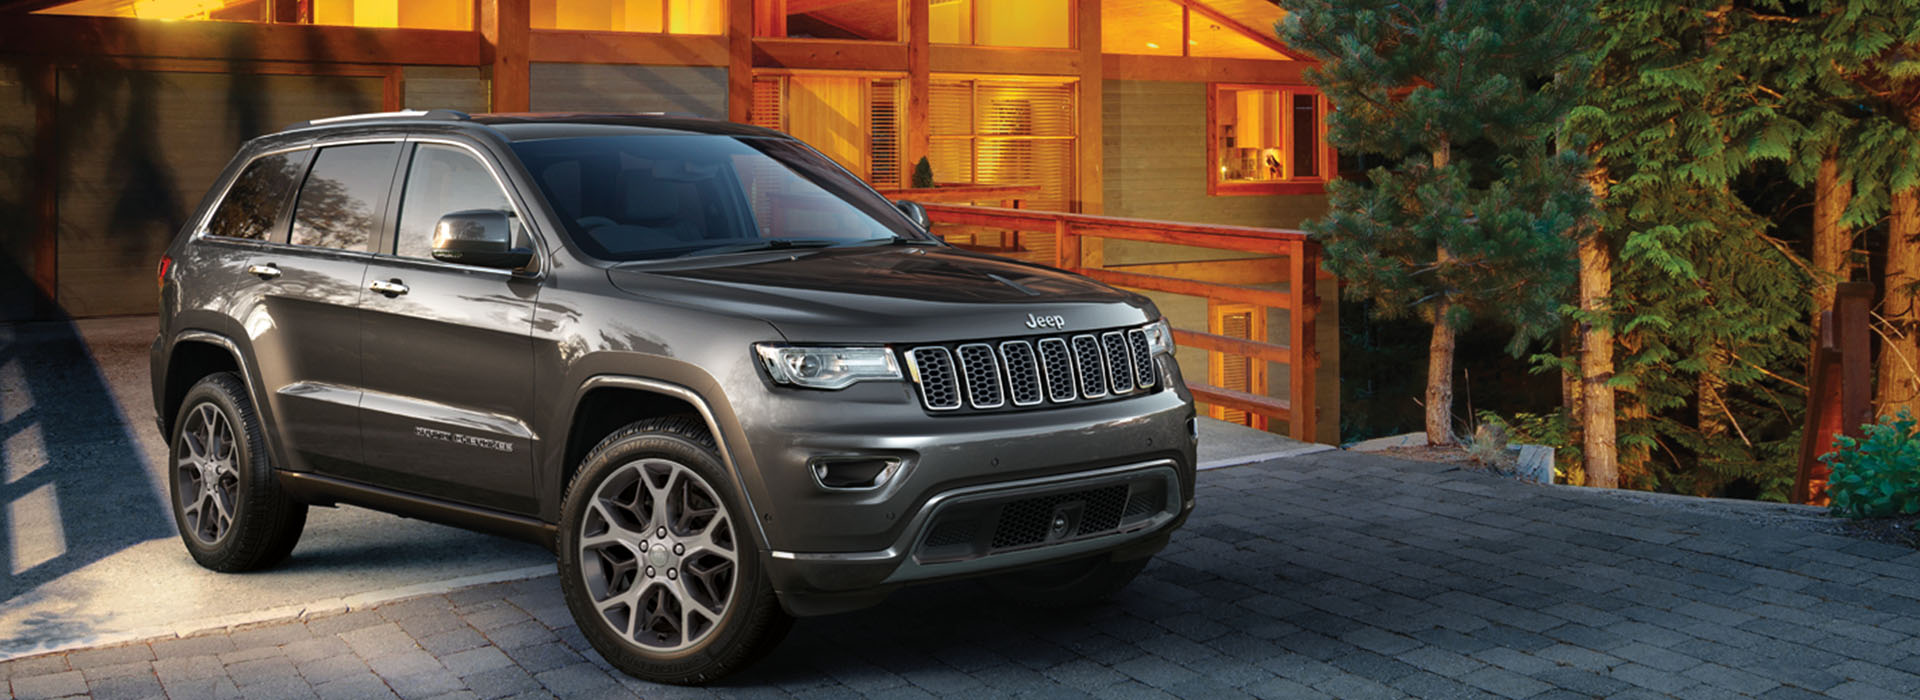 Jeep New Car Range